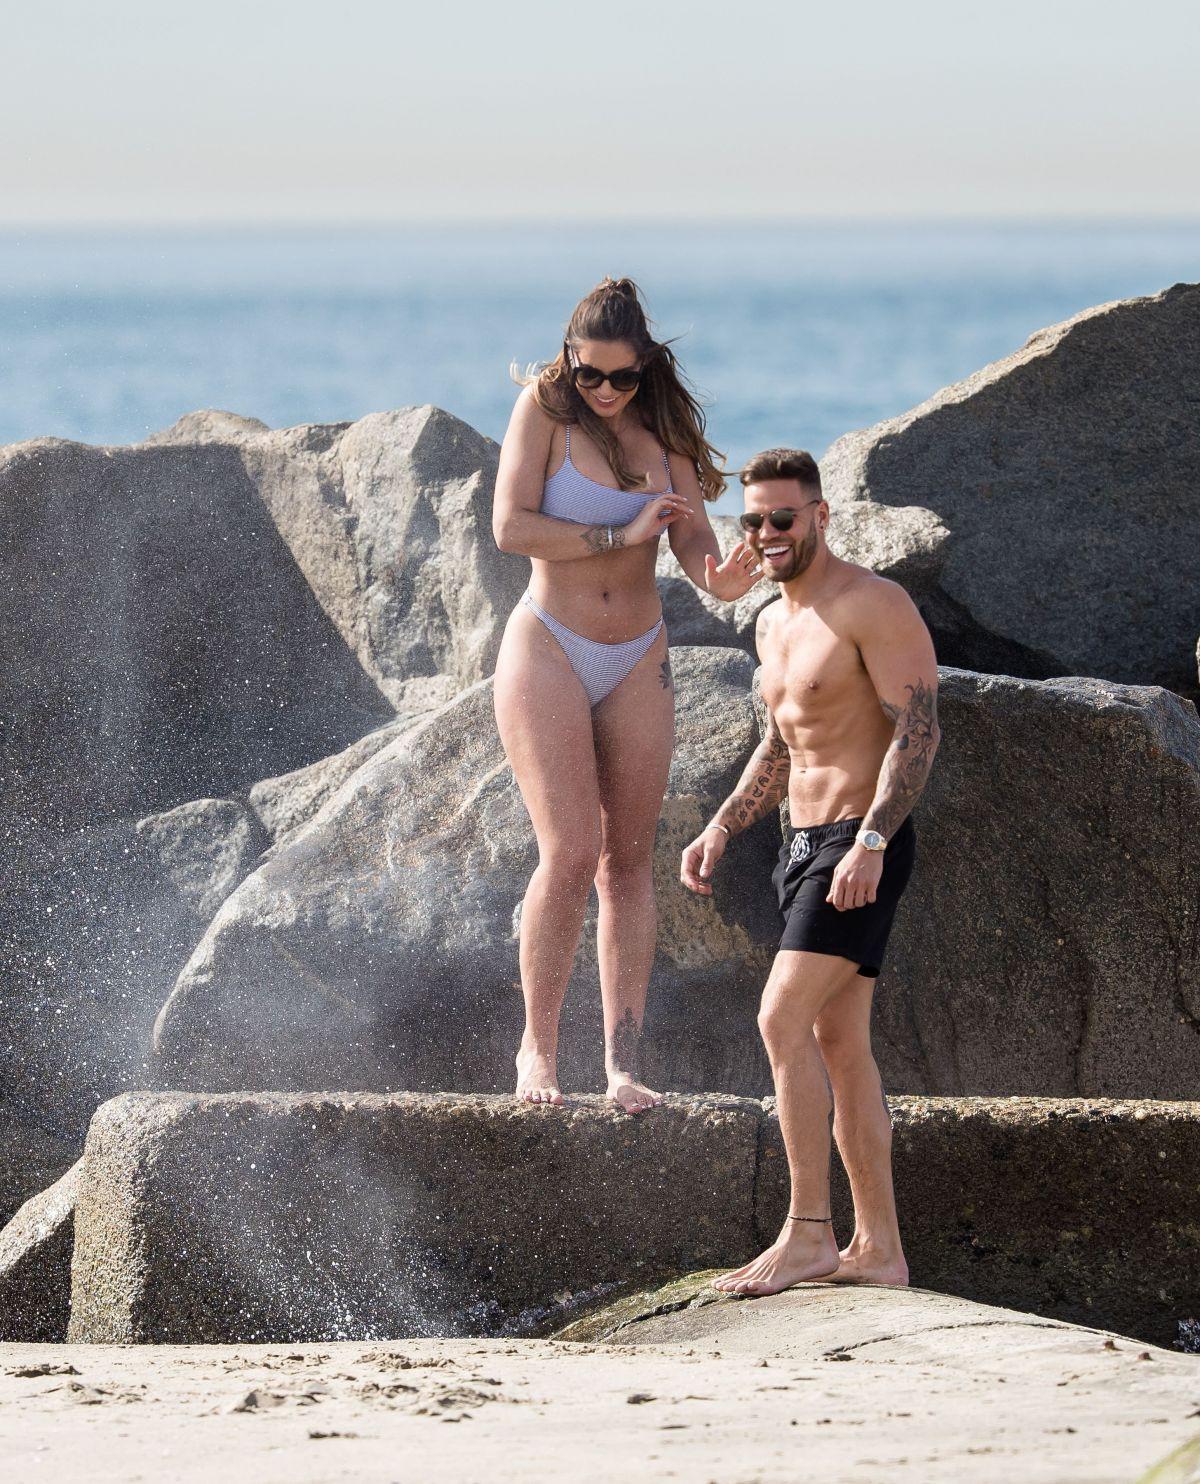 Jessica Shears in Bikini at the beach in Santa Monica Pic 8 of 35